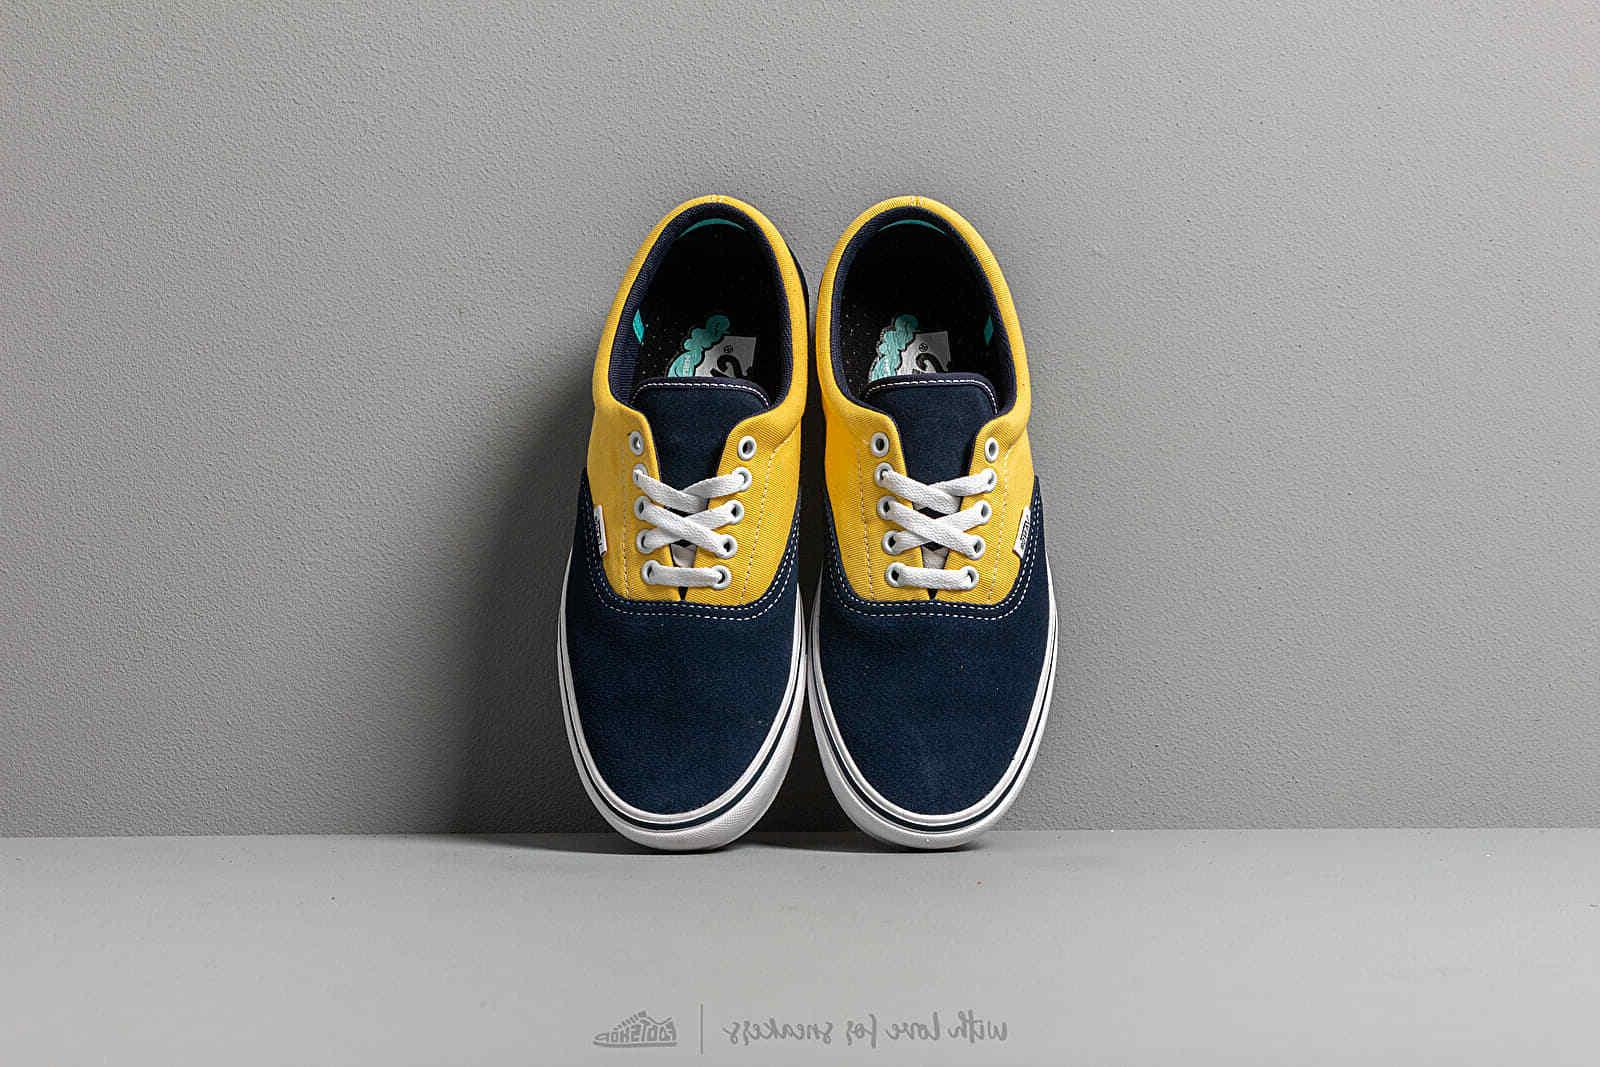 Dress Blue Skate Shoes